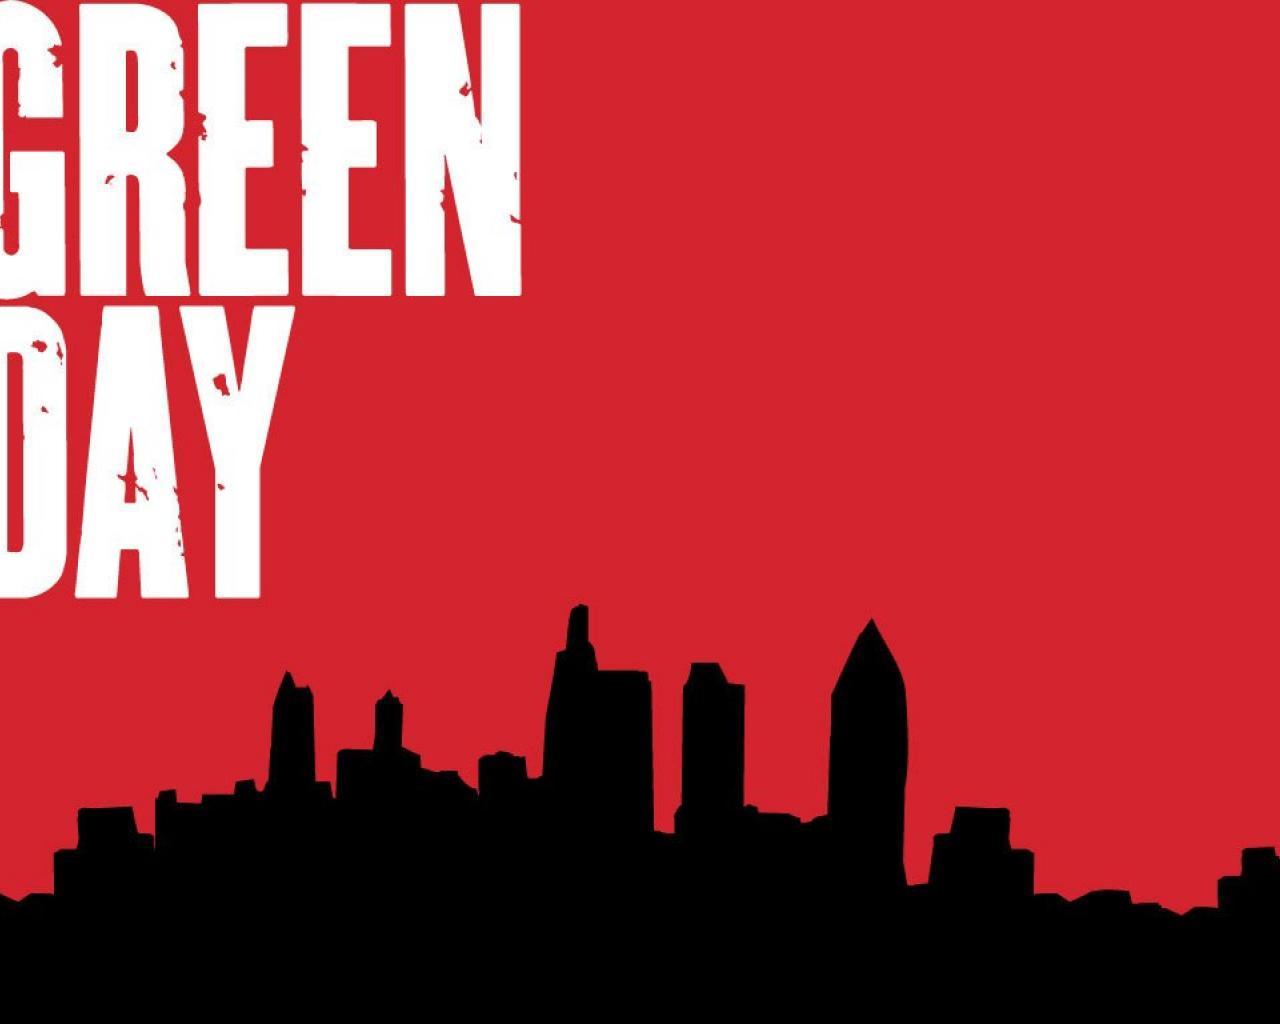 green day wallpaper iphone   wwwhigh definition wallpapercom 1280x1024